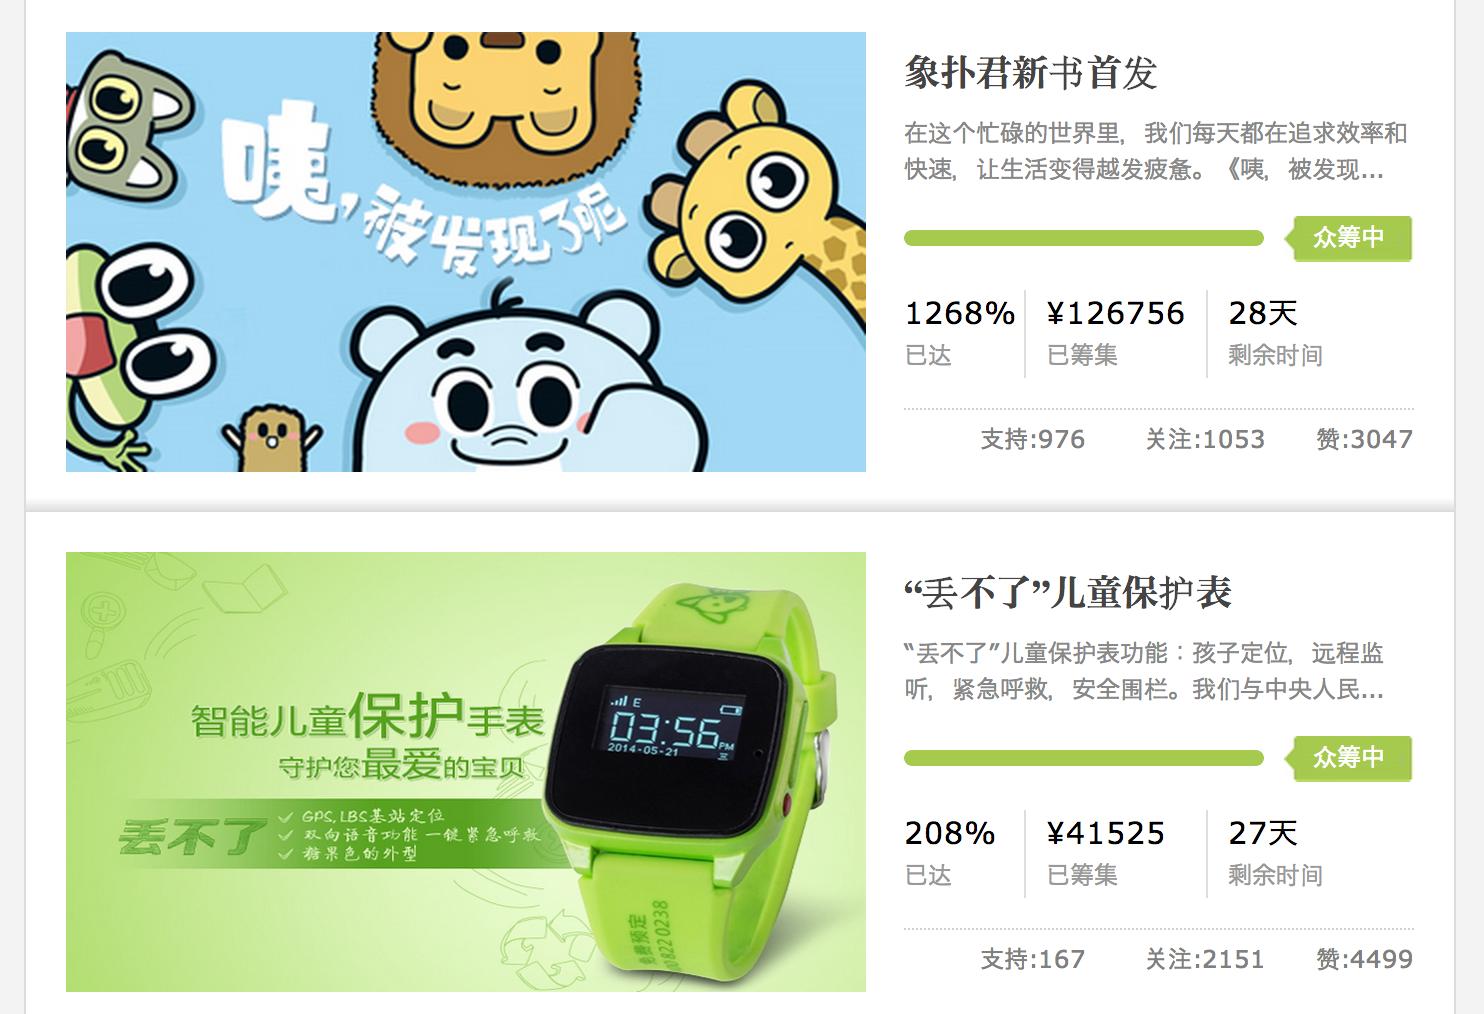 Le géant chinois JD lance sa plateforme de crowdfunding